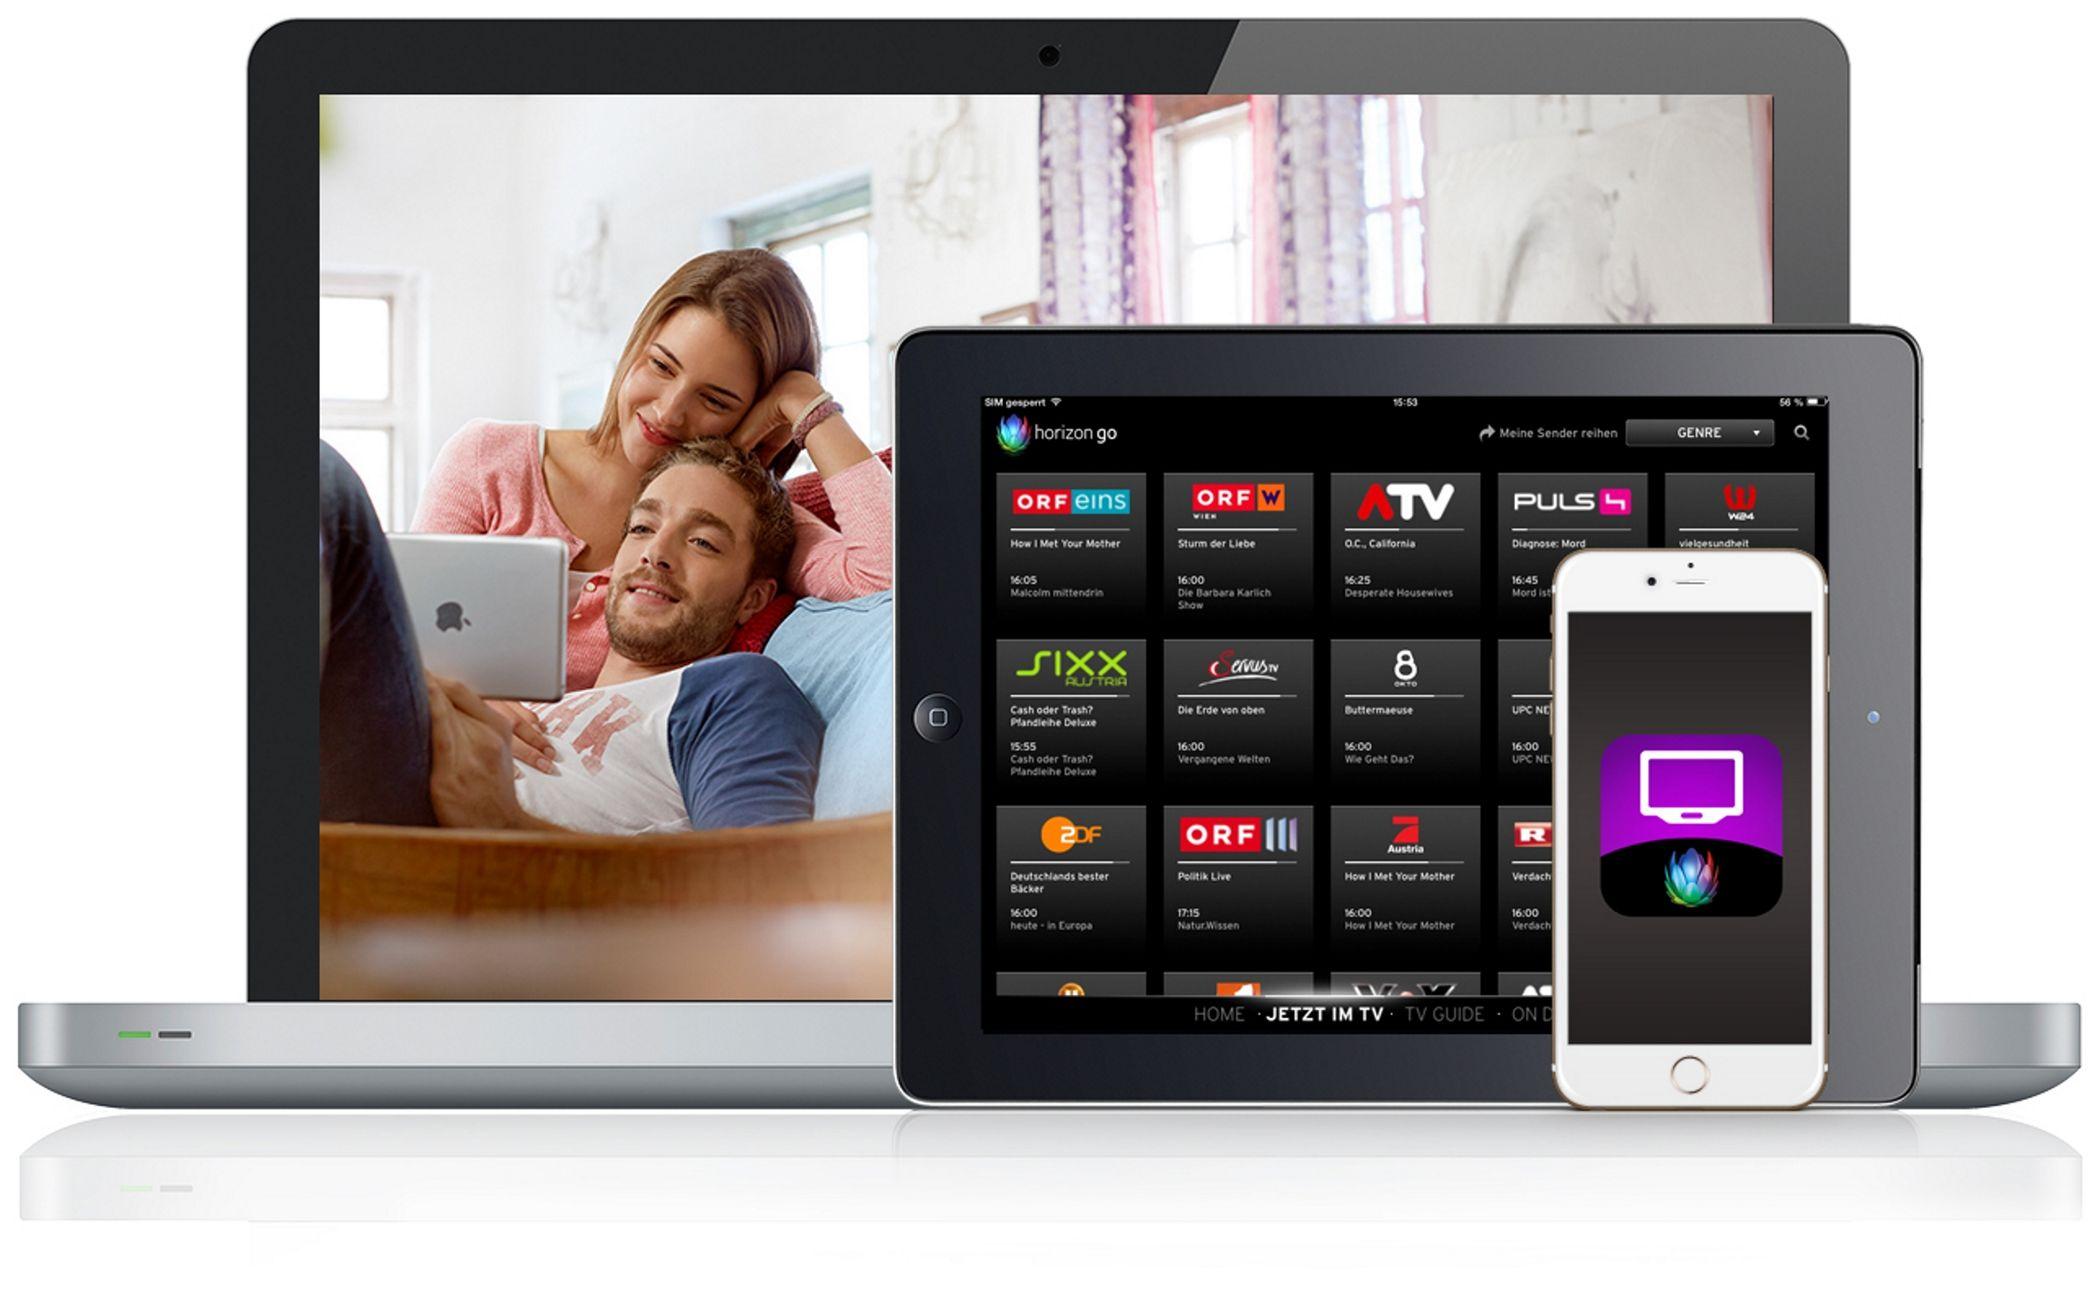 Ziggo adds Replay TV to Horizon Go app - Broadband TV News